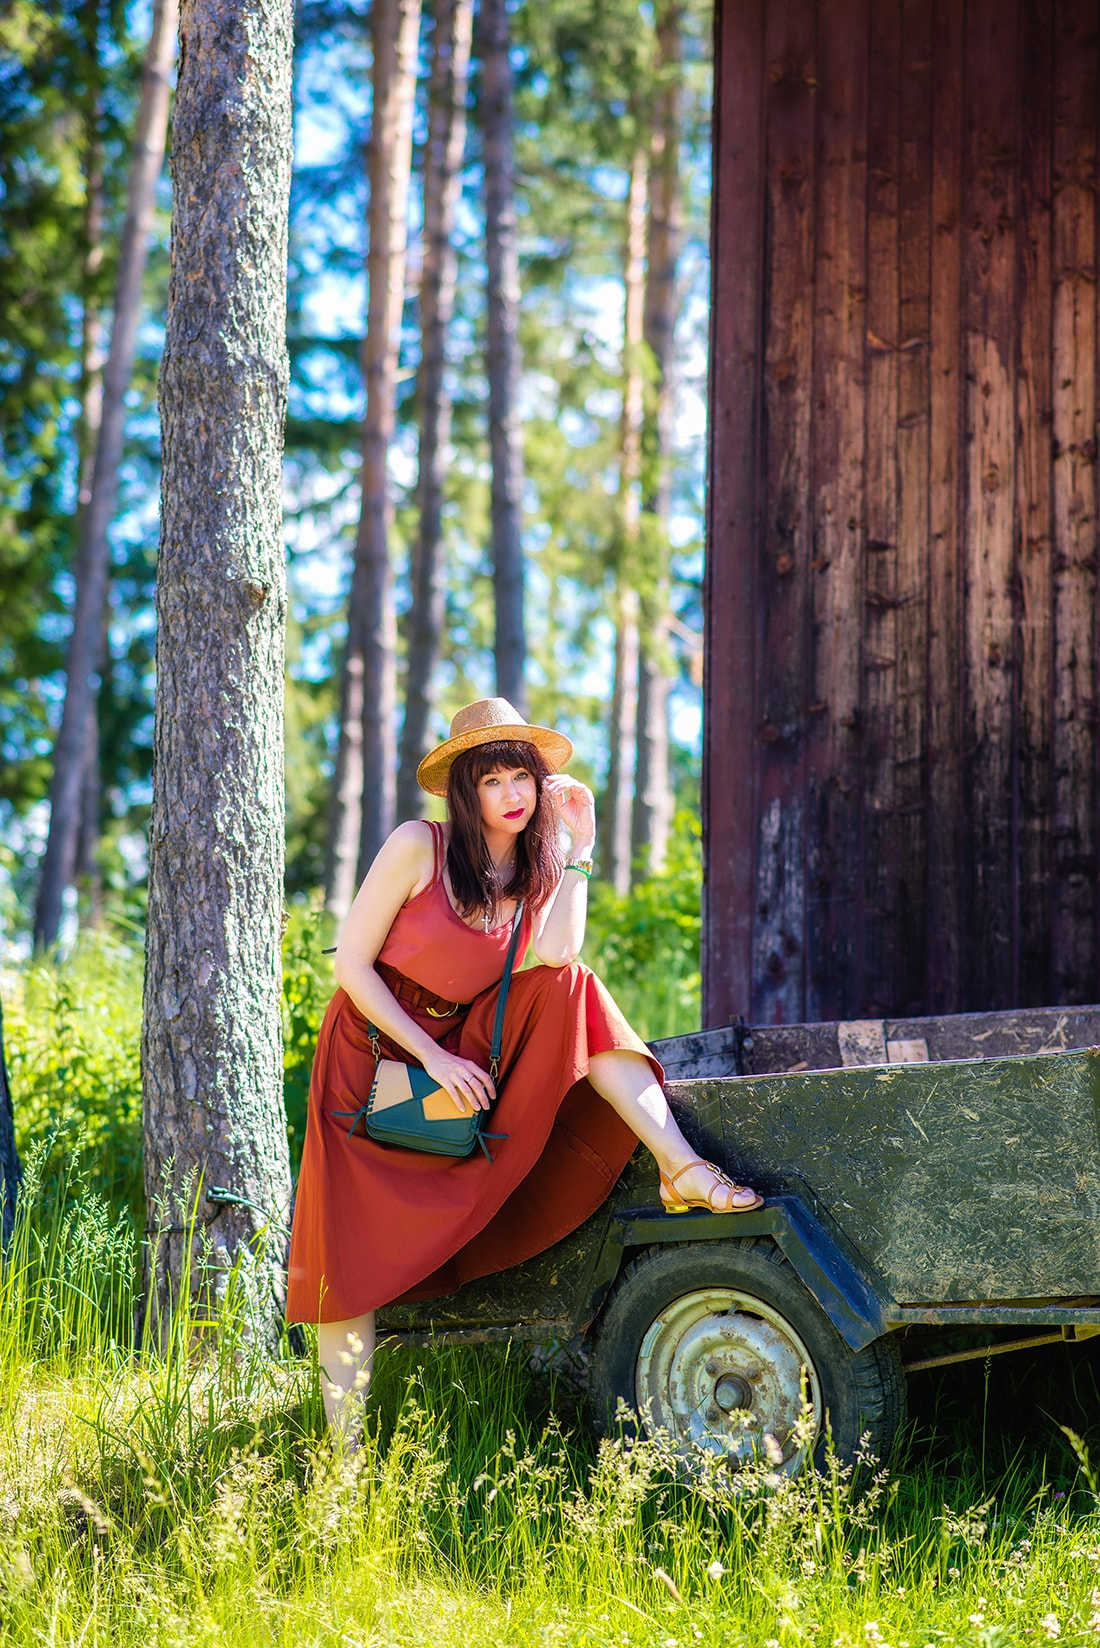 KEĎ KLOBÚK LADÍ S KABELKOU_Katharine-fashion is beautiful_blog 9_Slamený klobúk Parfois_Áčková sukňa Zara_Kabelka Parfois_Katarína Jakubčová_Fashion blogger